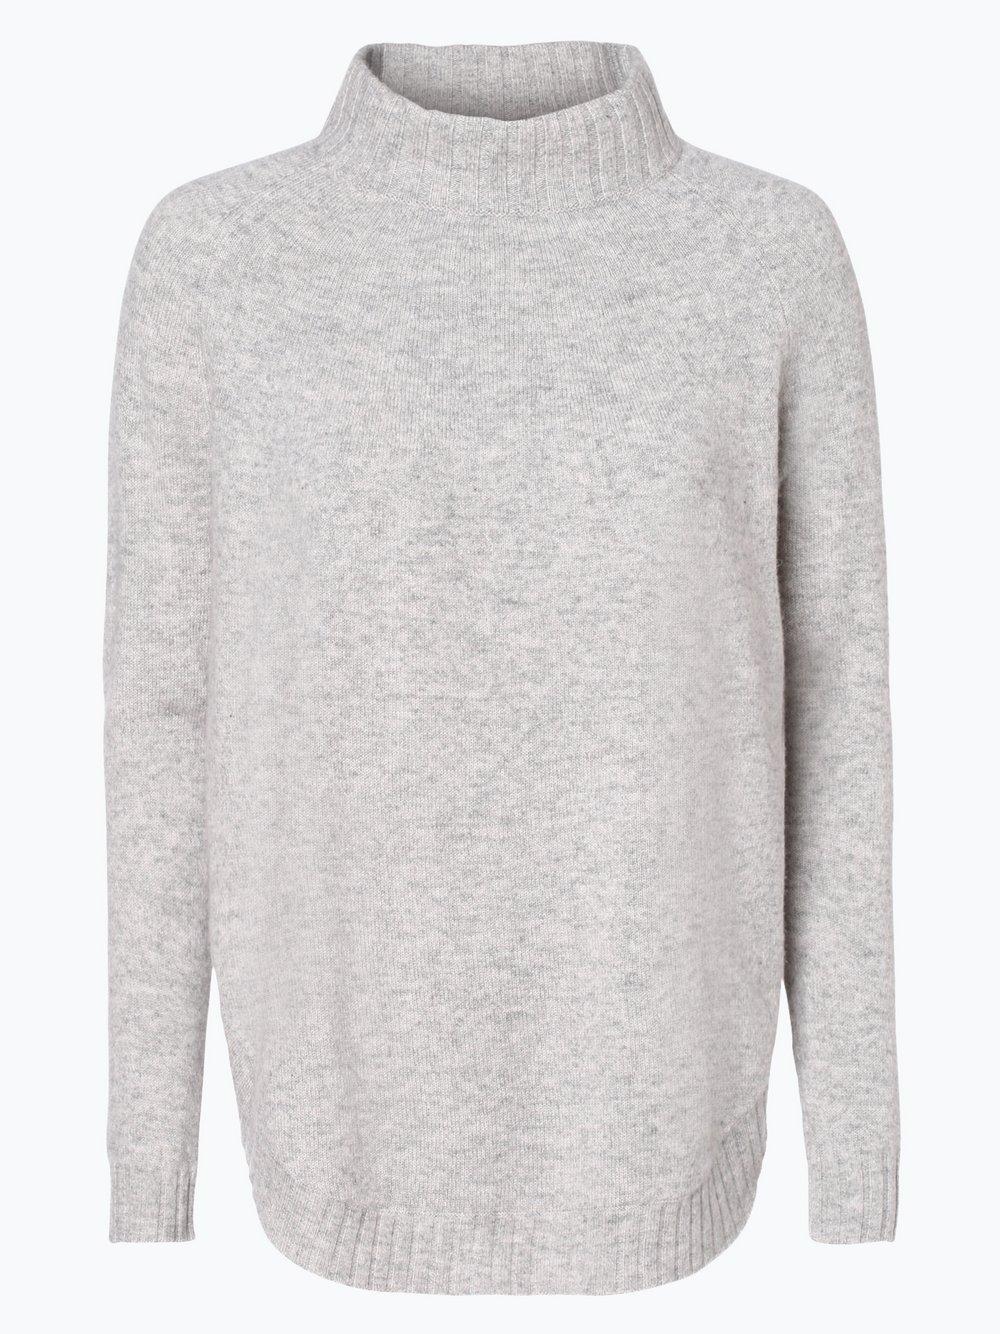 beliebt kaufen 2ea00 8c29d s.Oliver BLACK LABEL Damen Pure Cashmere Pullover online ...